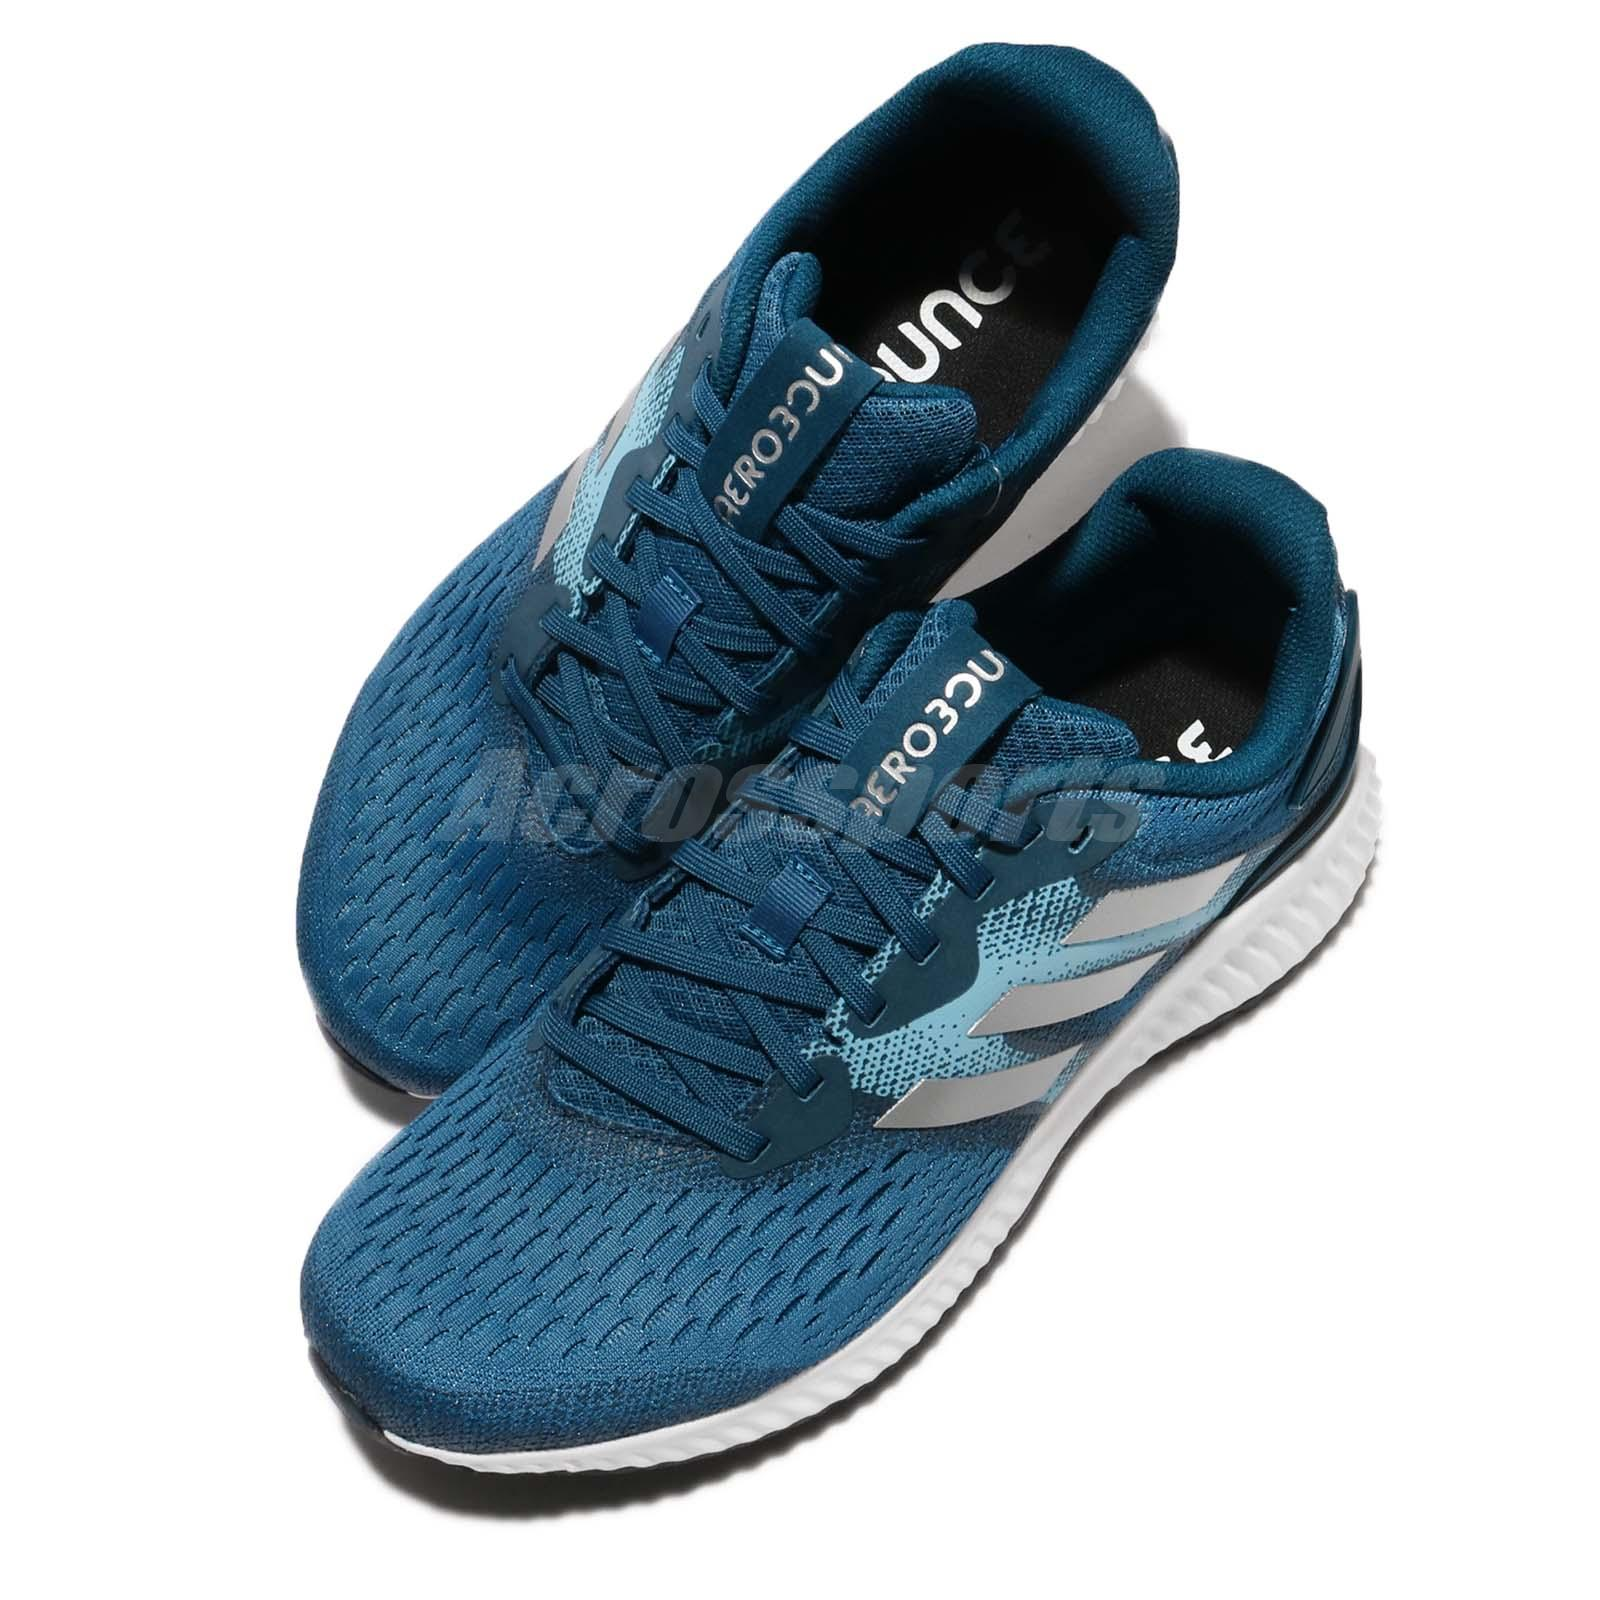 5cf8518277c4 Black Adidas Nmd Us 7 Terrex Swift R